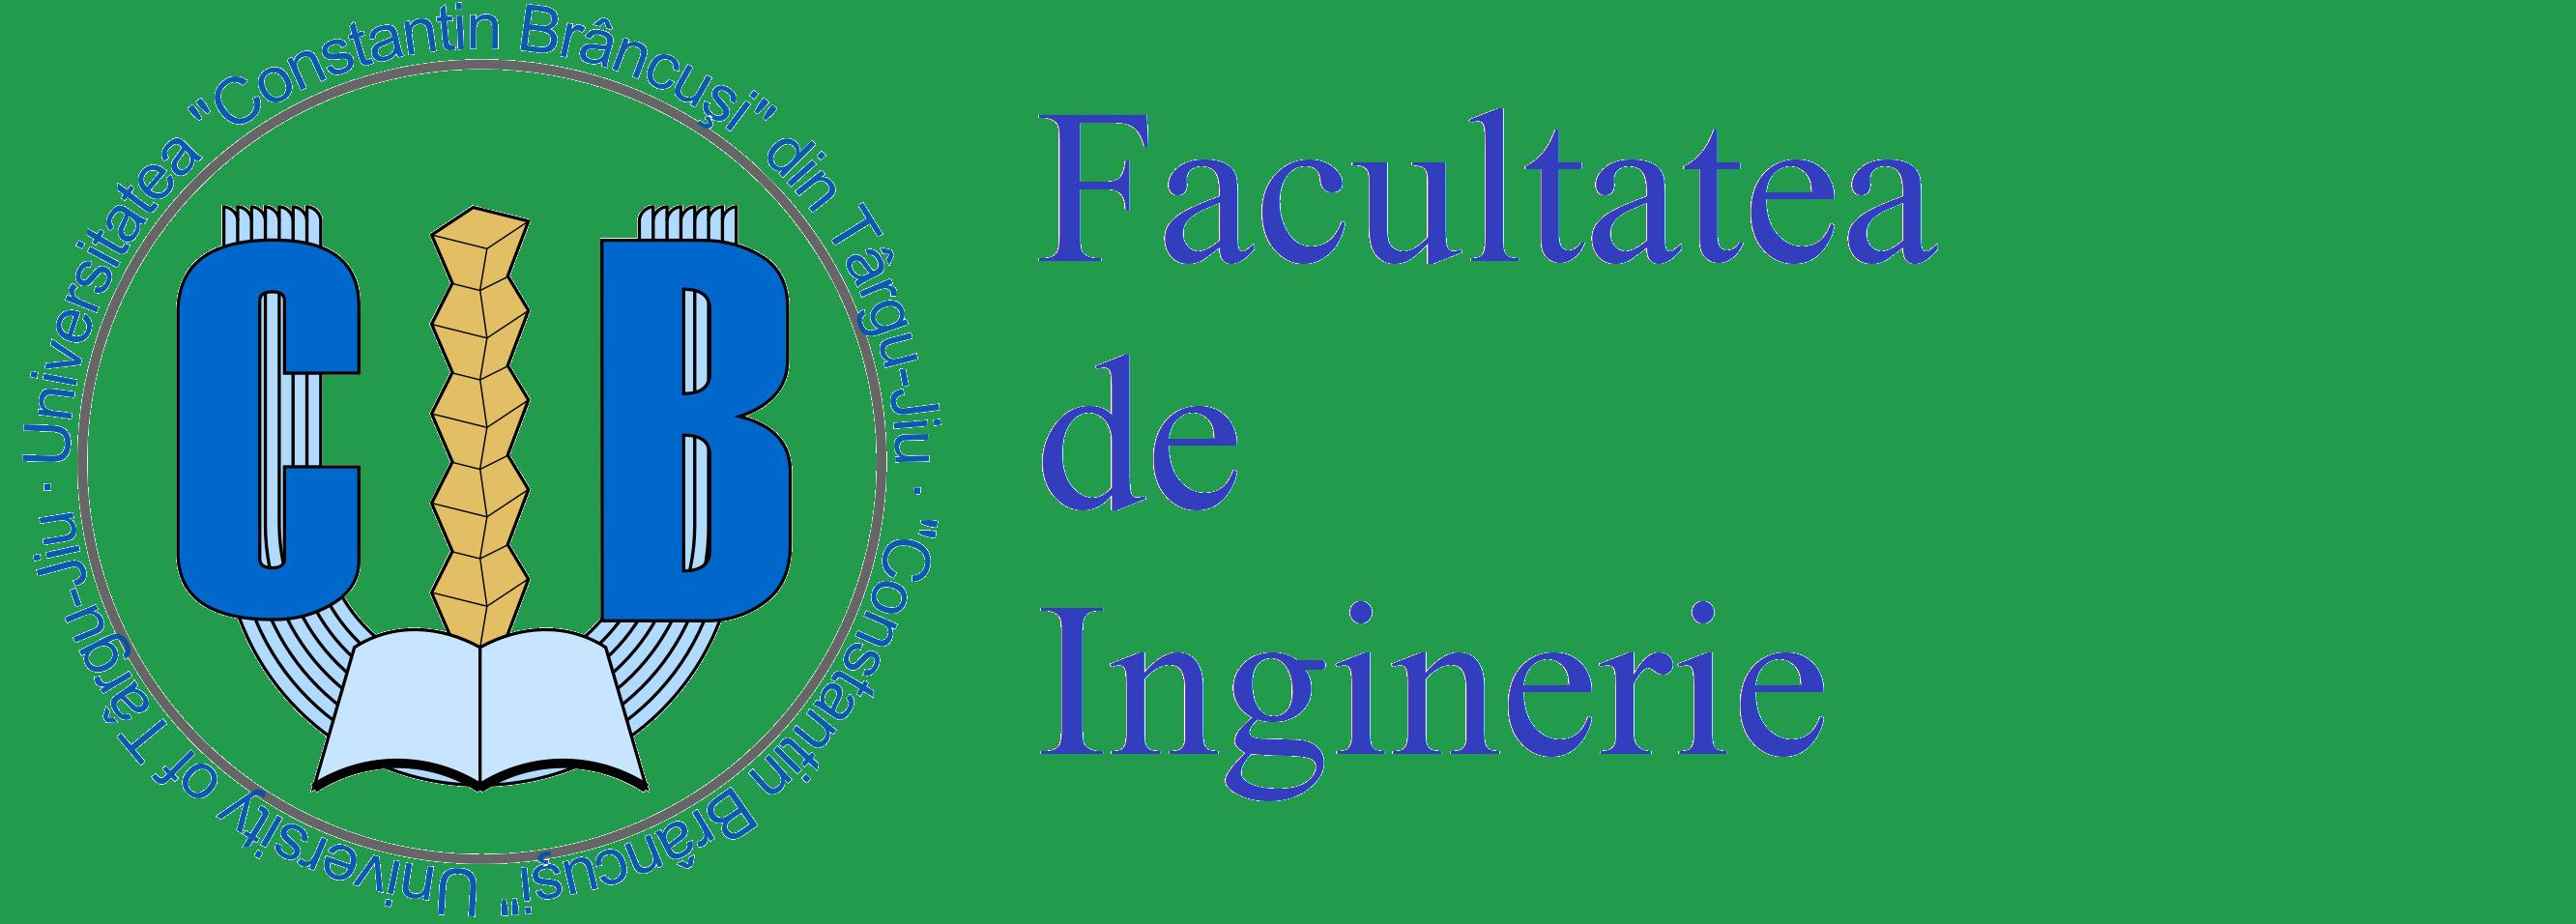 Facultatea de Inginerie